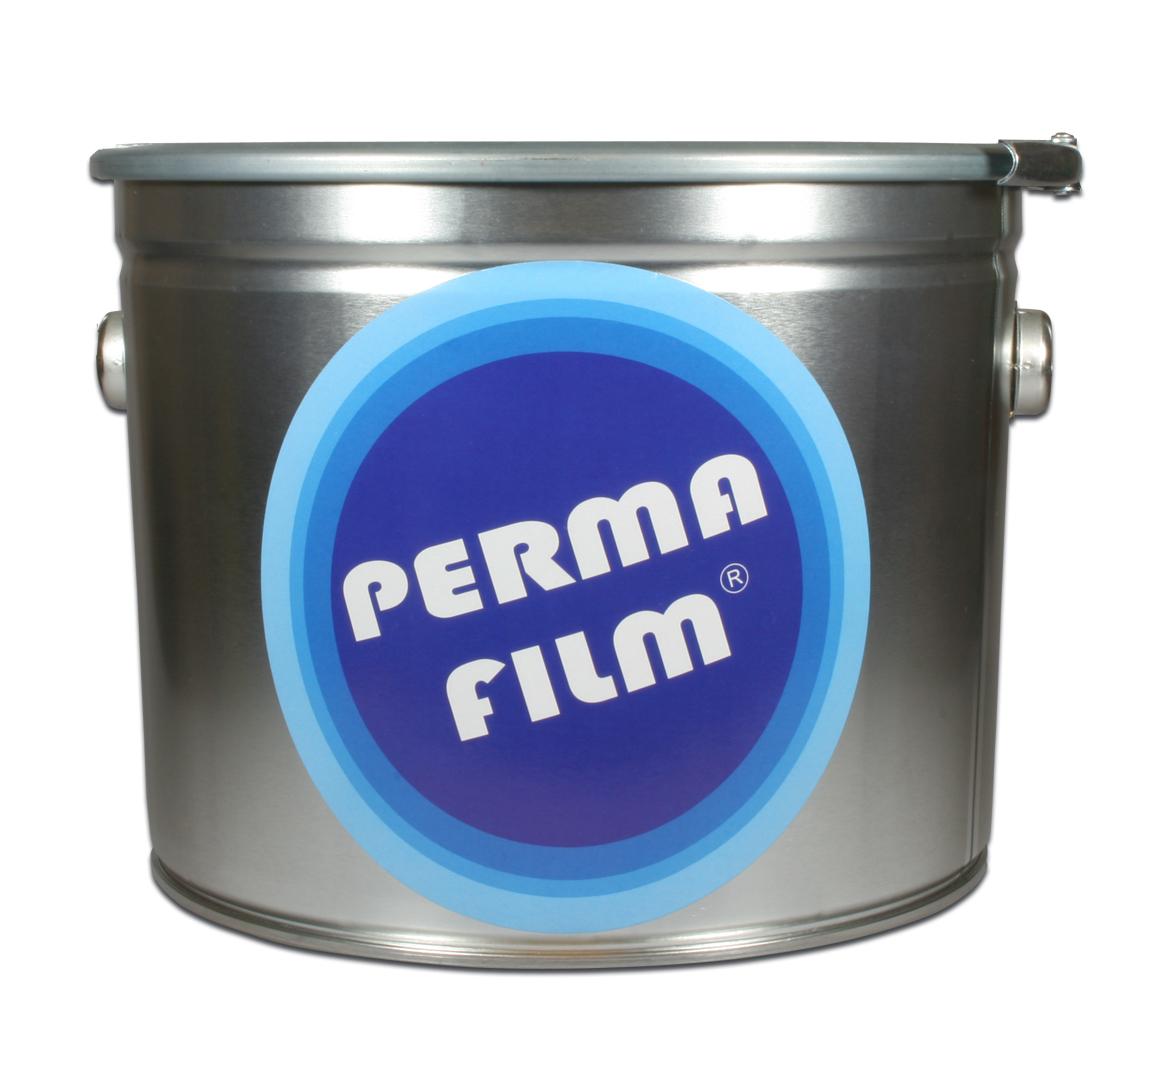 Perma Film 3 liter